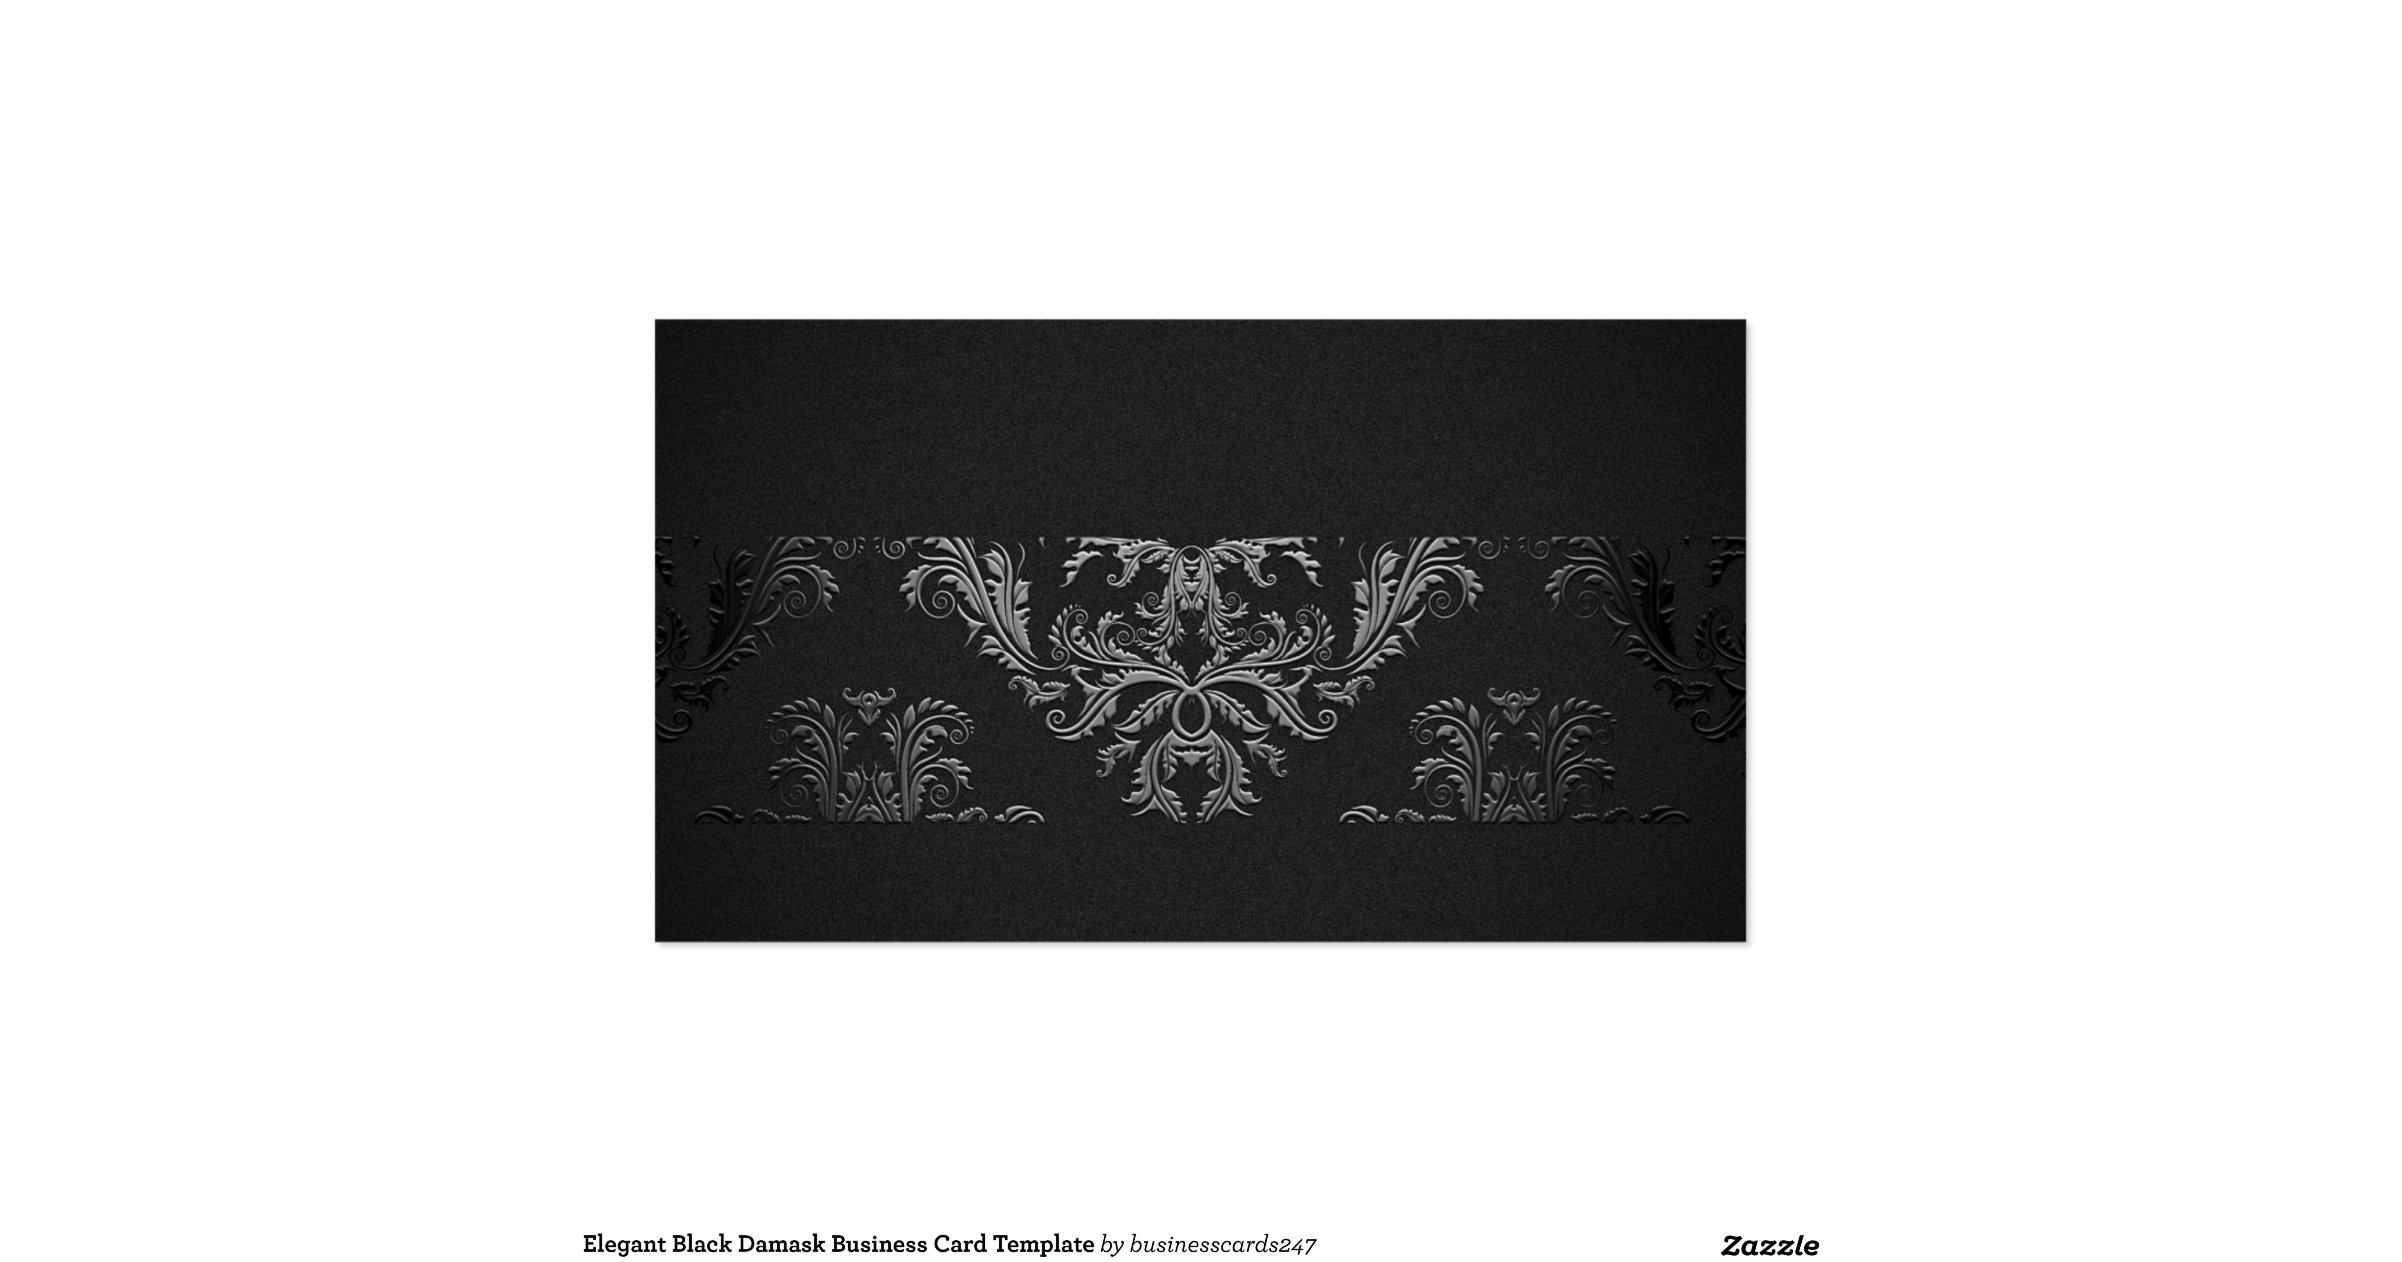 black damask art business - photo #40